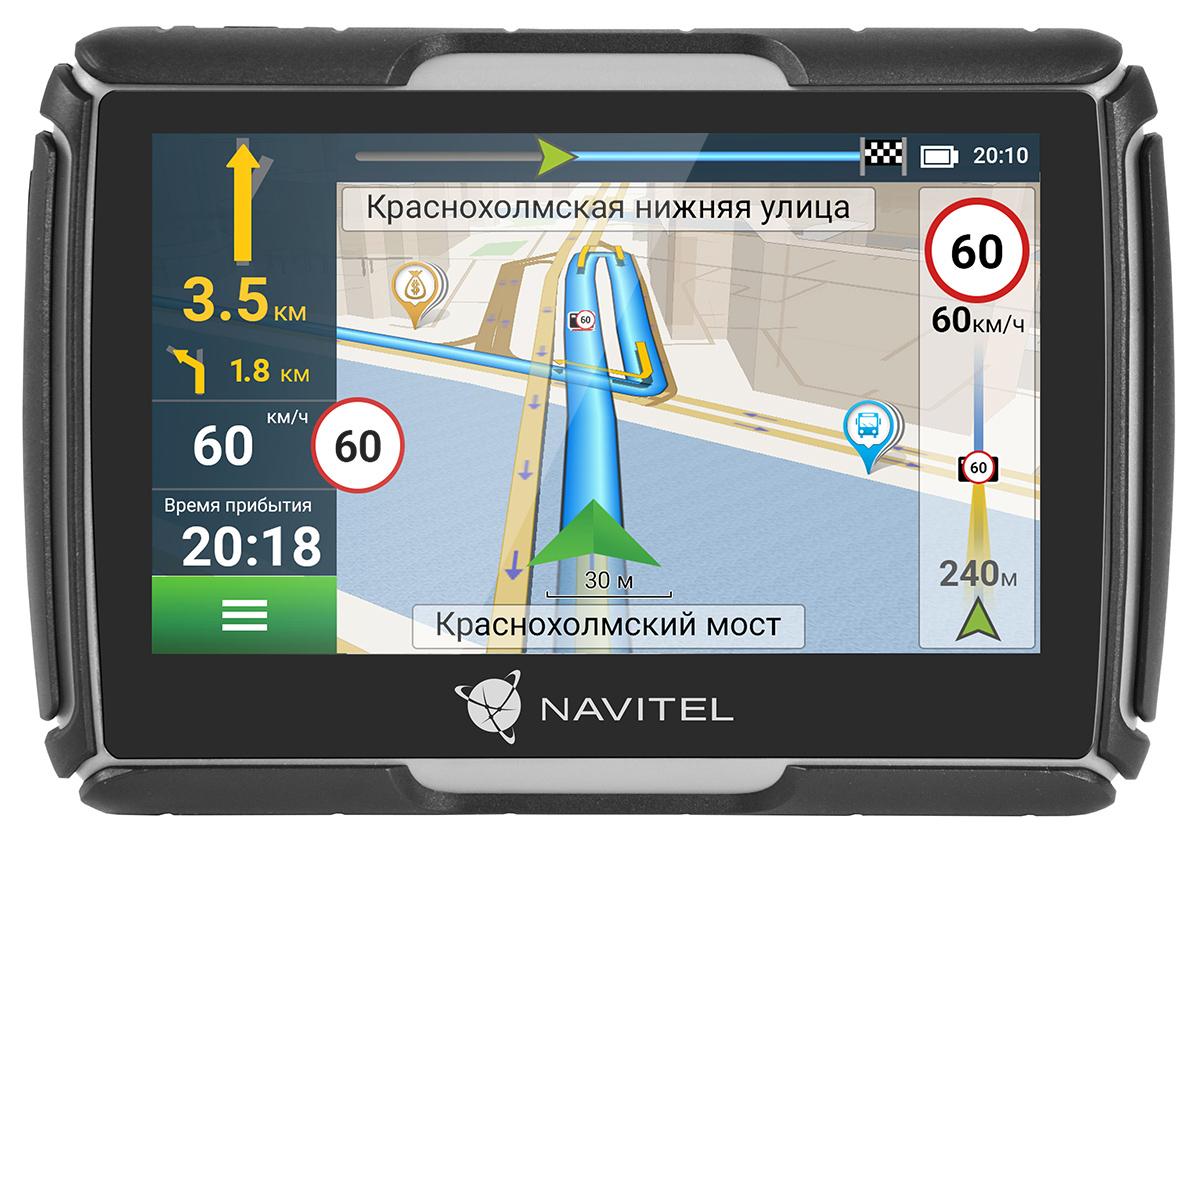 Mото навигатор Navitel G550 (+ Разветвитель в подарок!)